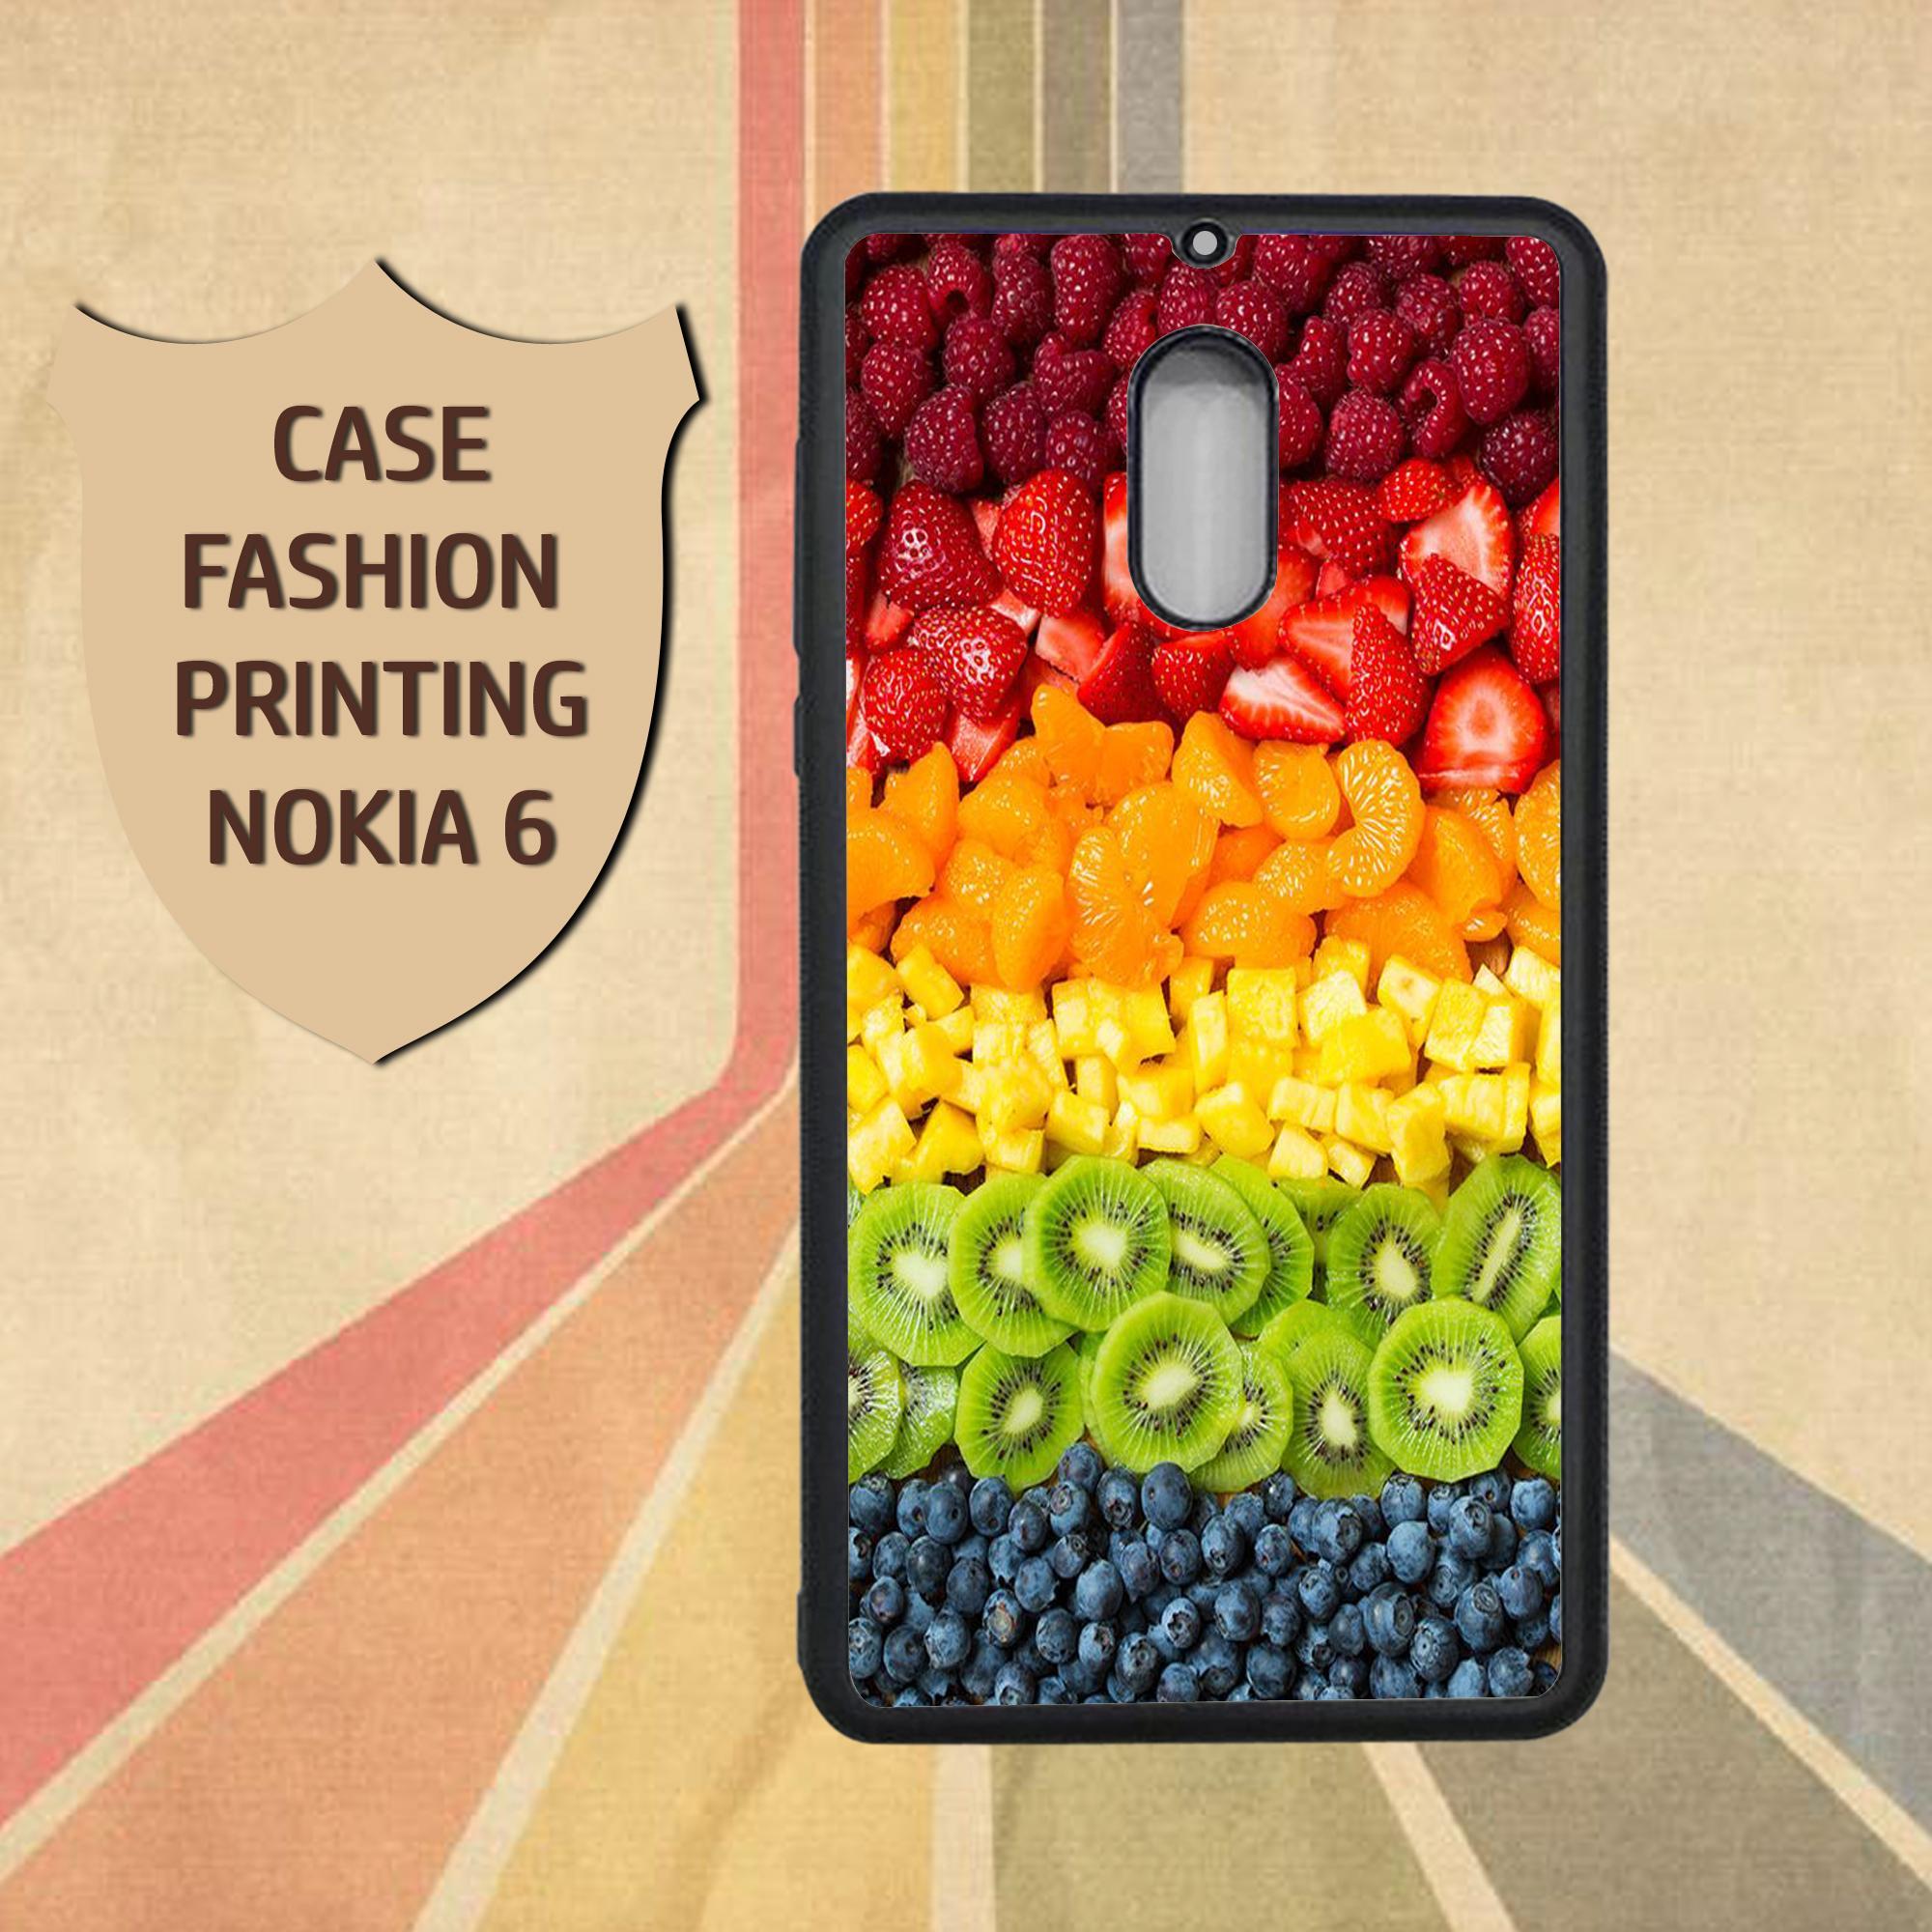 Rajamurah fasion printing case Nokia6 - 9